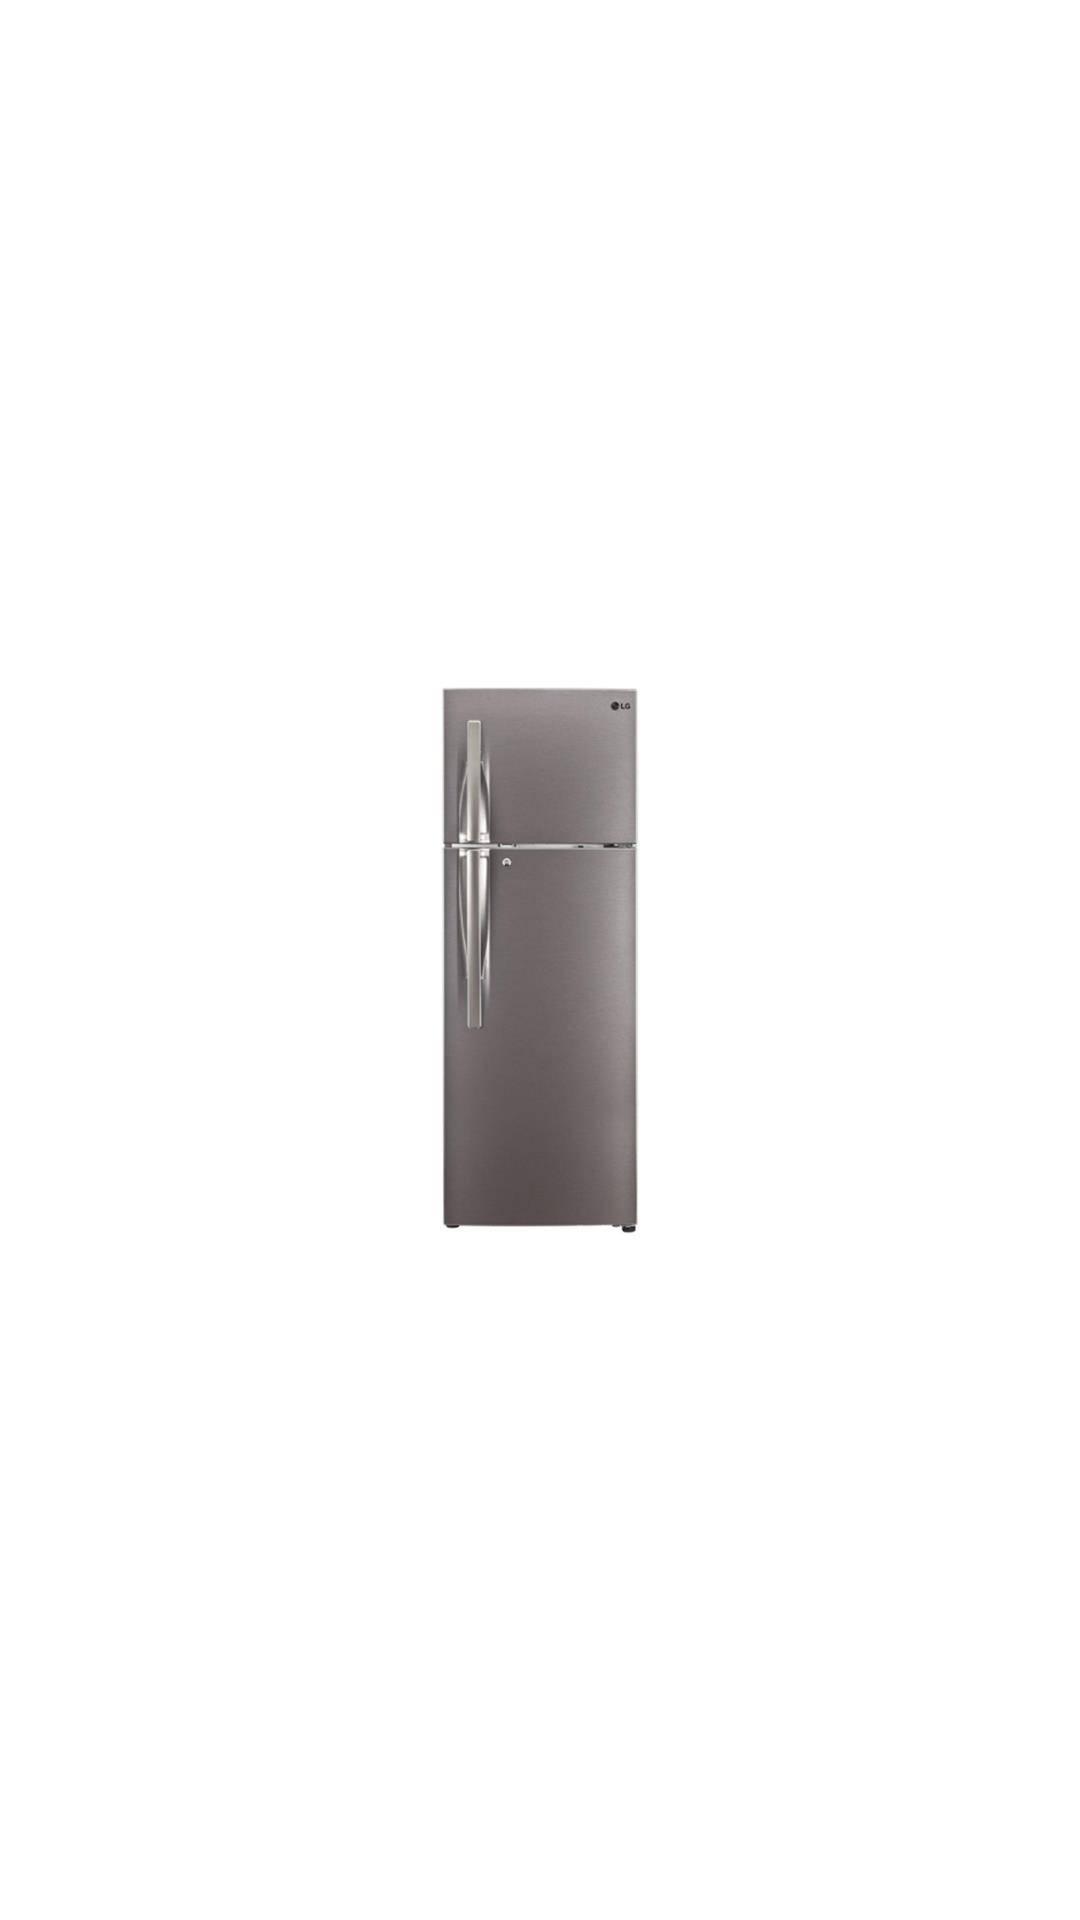 LG GL-T322RDSU 308 L 3 Star Frost Free Inverter Double Door Refrigerator